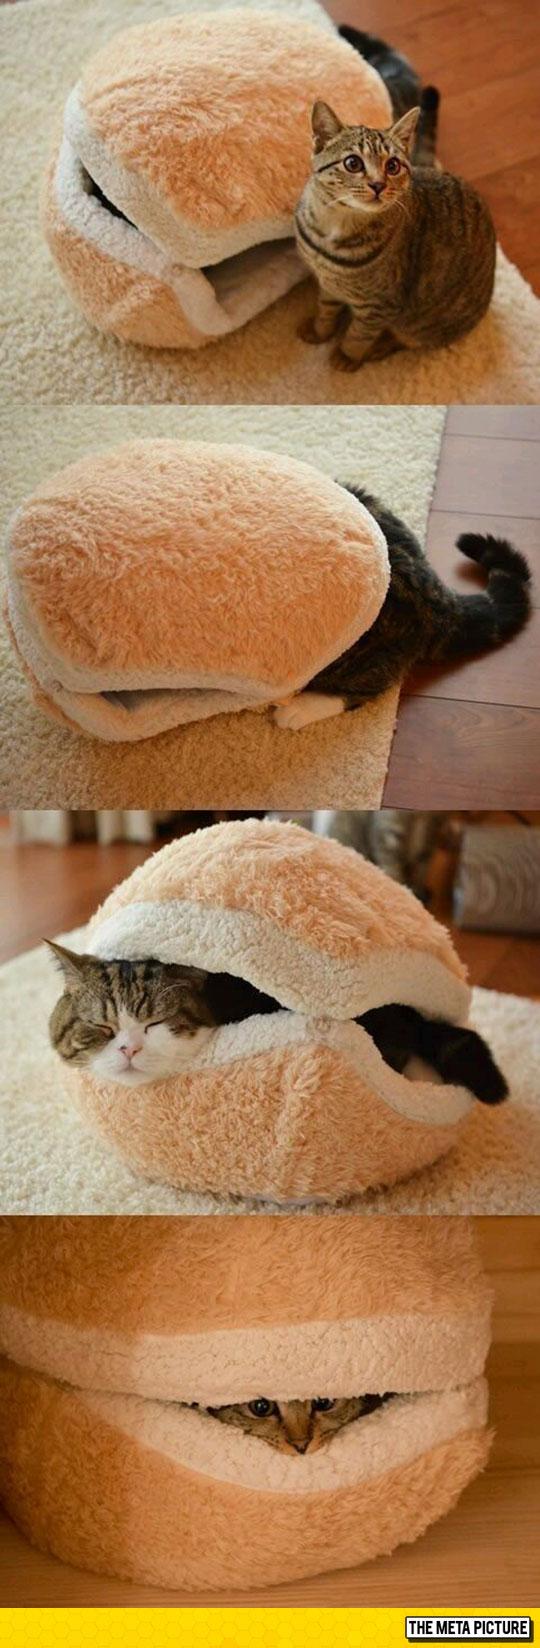 Epic Cat Burger Bed